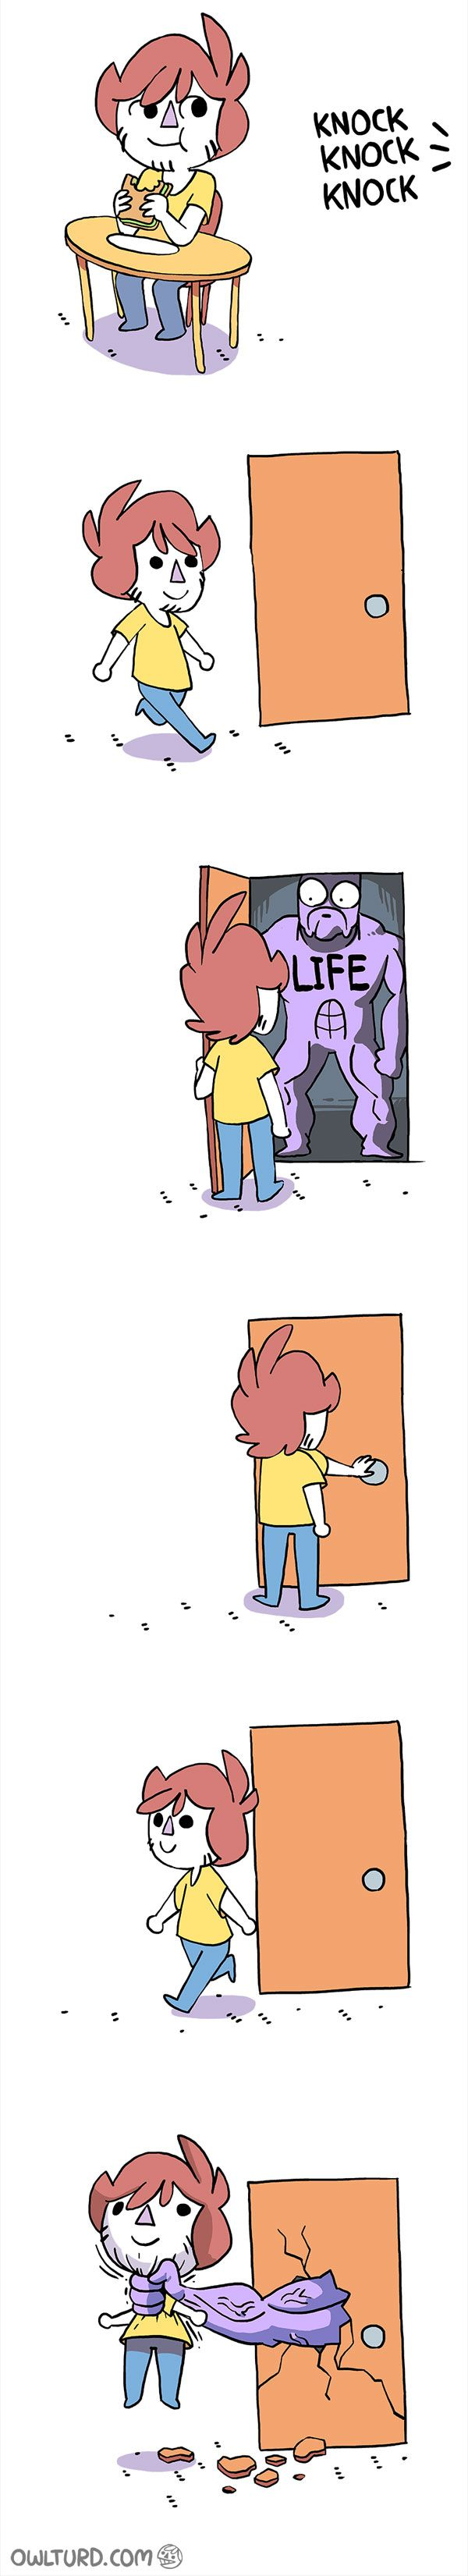 Life [Comic]